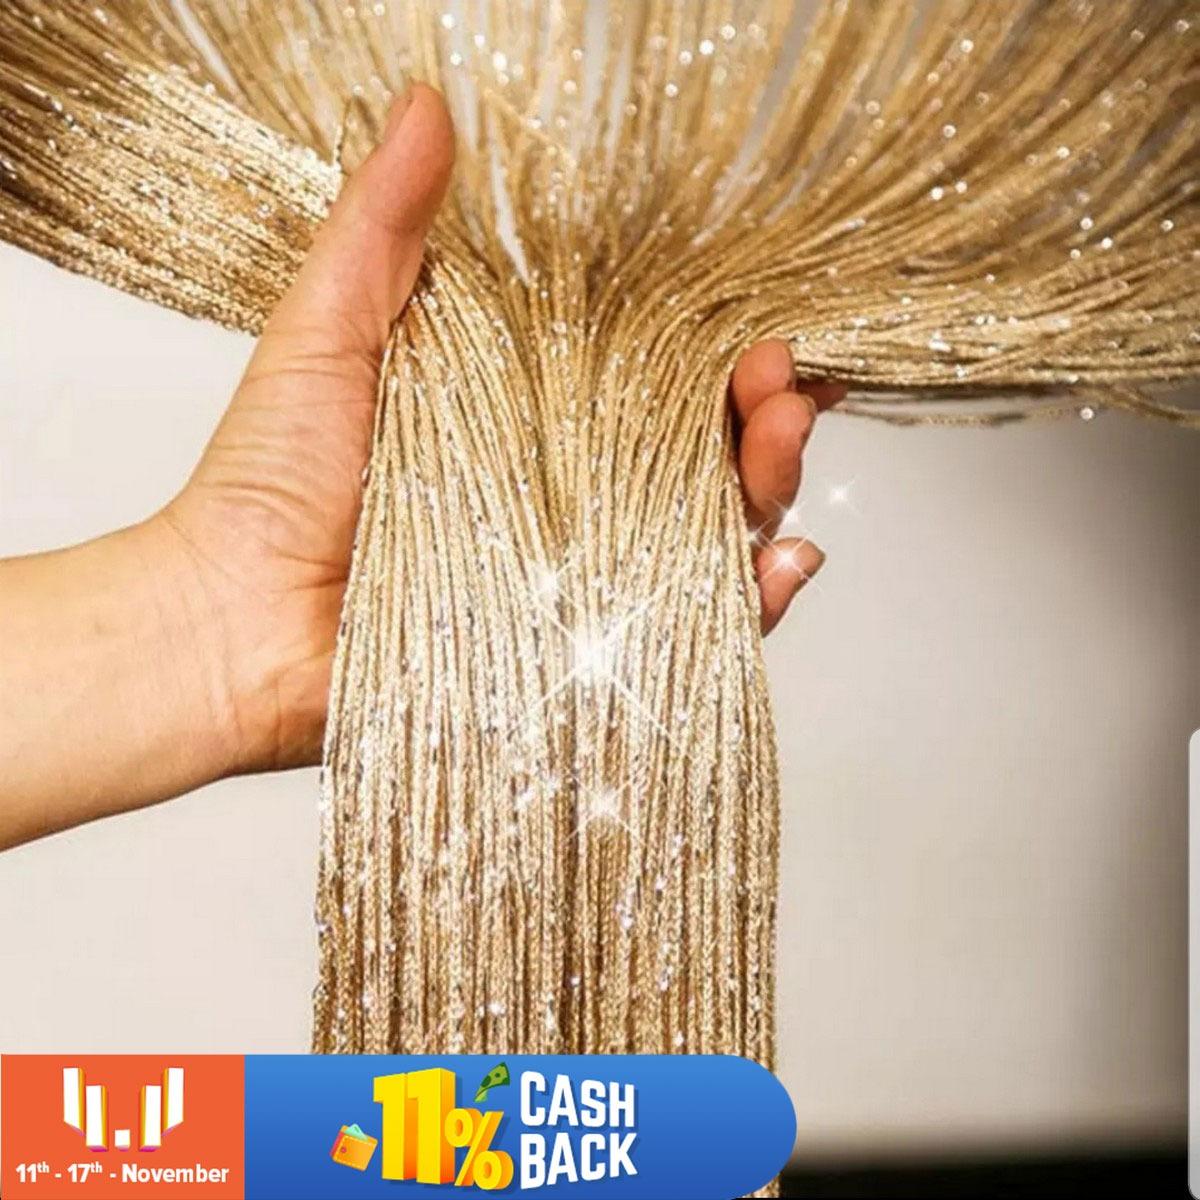 100x200cm Shiny Tassel Flash Golden Line String Curtain Window Door Divider Sheer Curtain Valance Door Treatment Home Decoration1